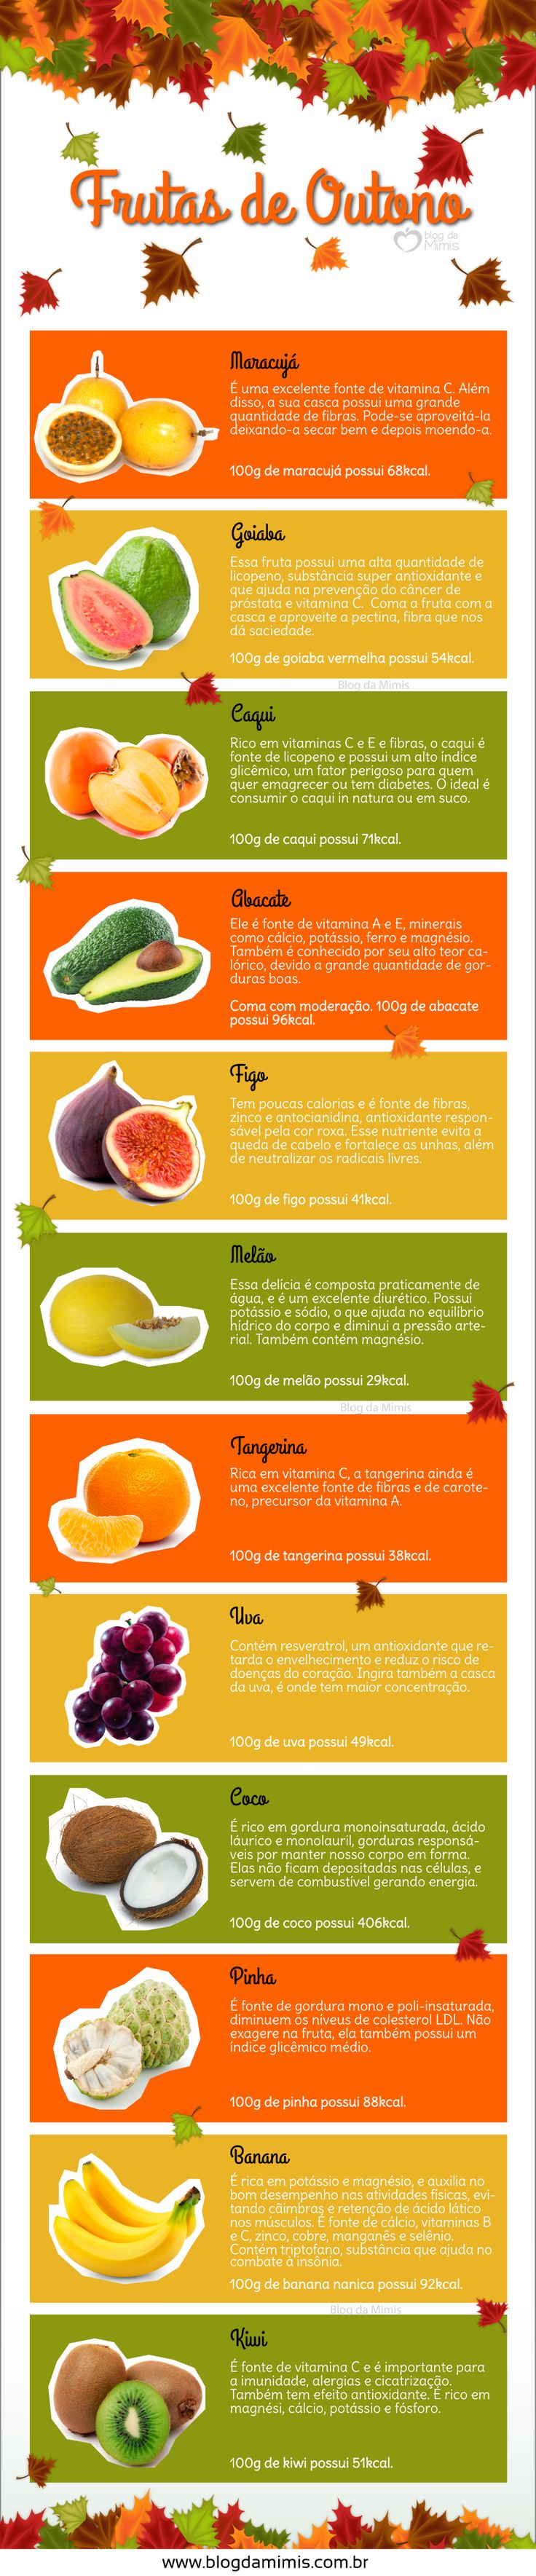 Frutas-de-outono-blog-da-mimis-michelle-franzoni-post